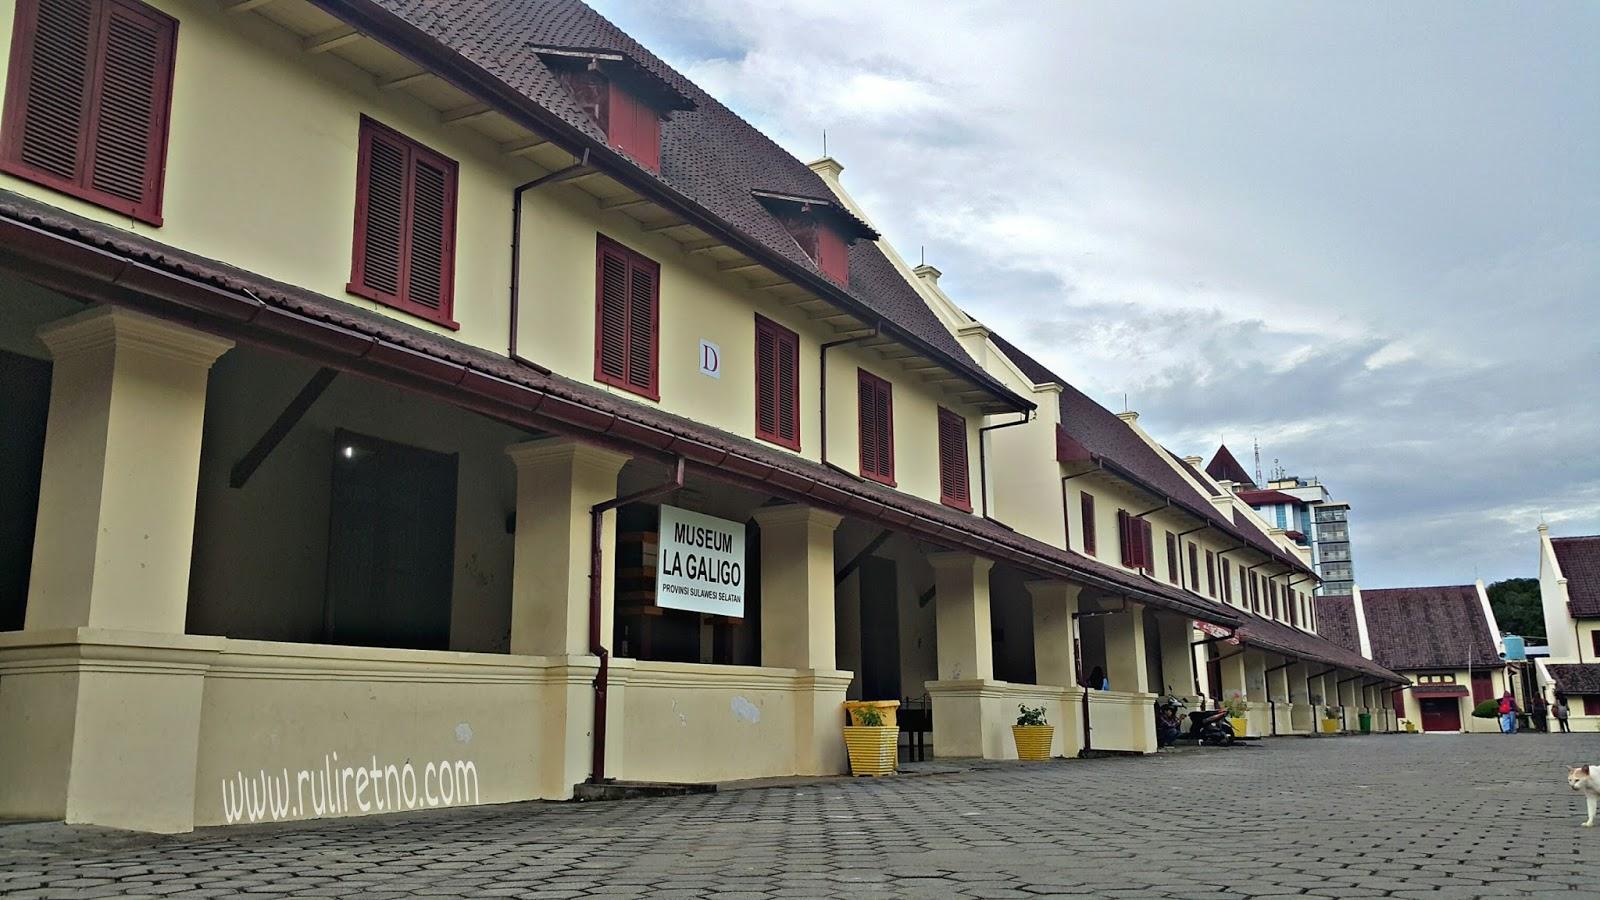 Ruliretno Tentang Museum La Galigo Fort Rotterdam Makassar Kalian Search